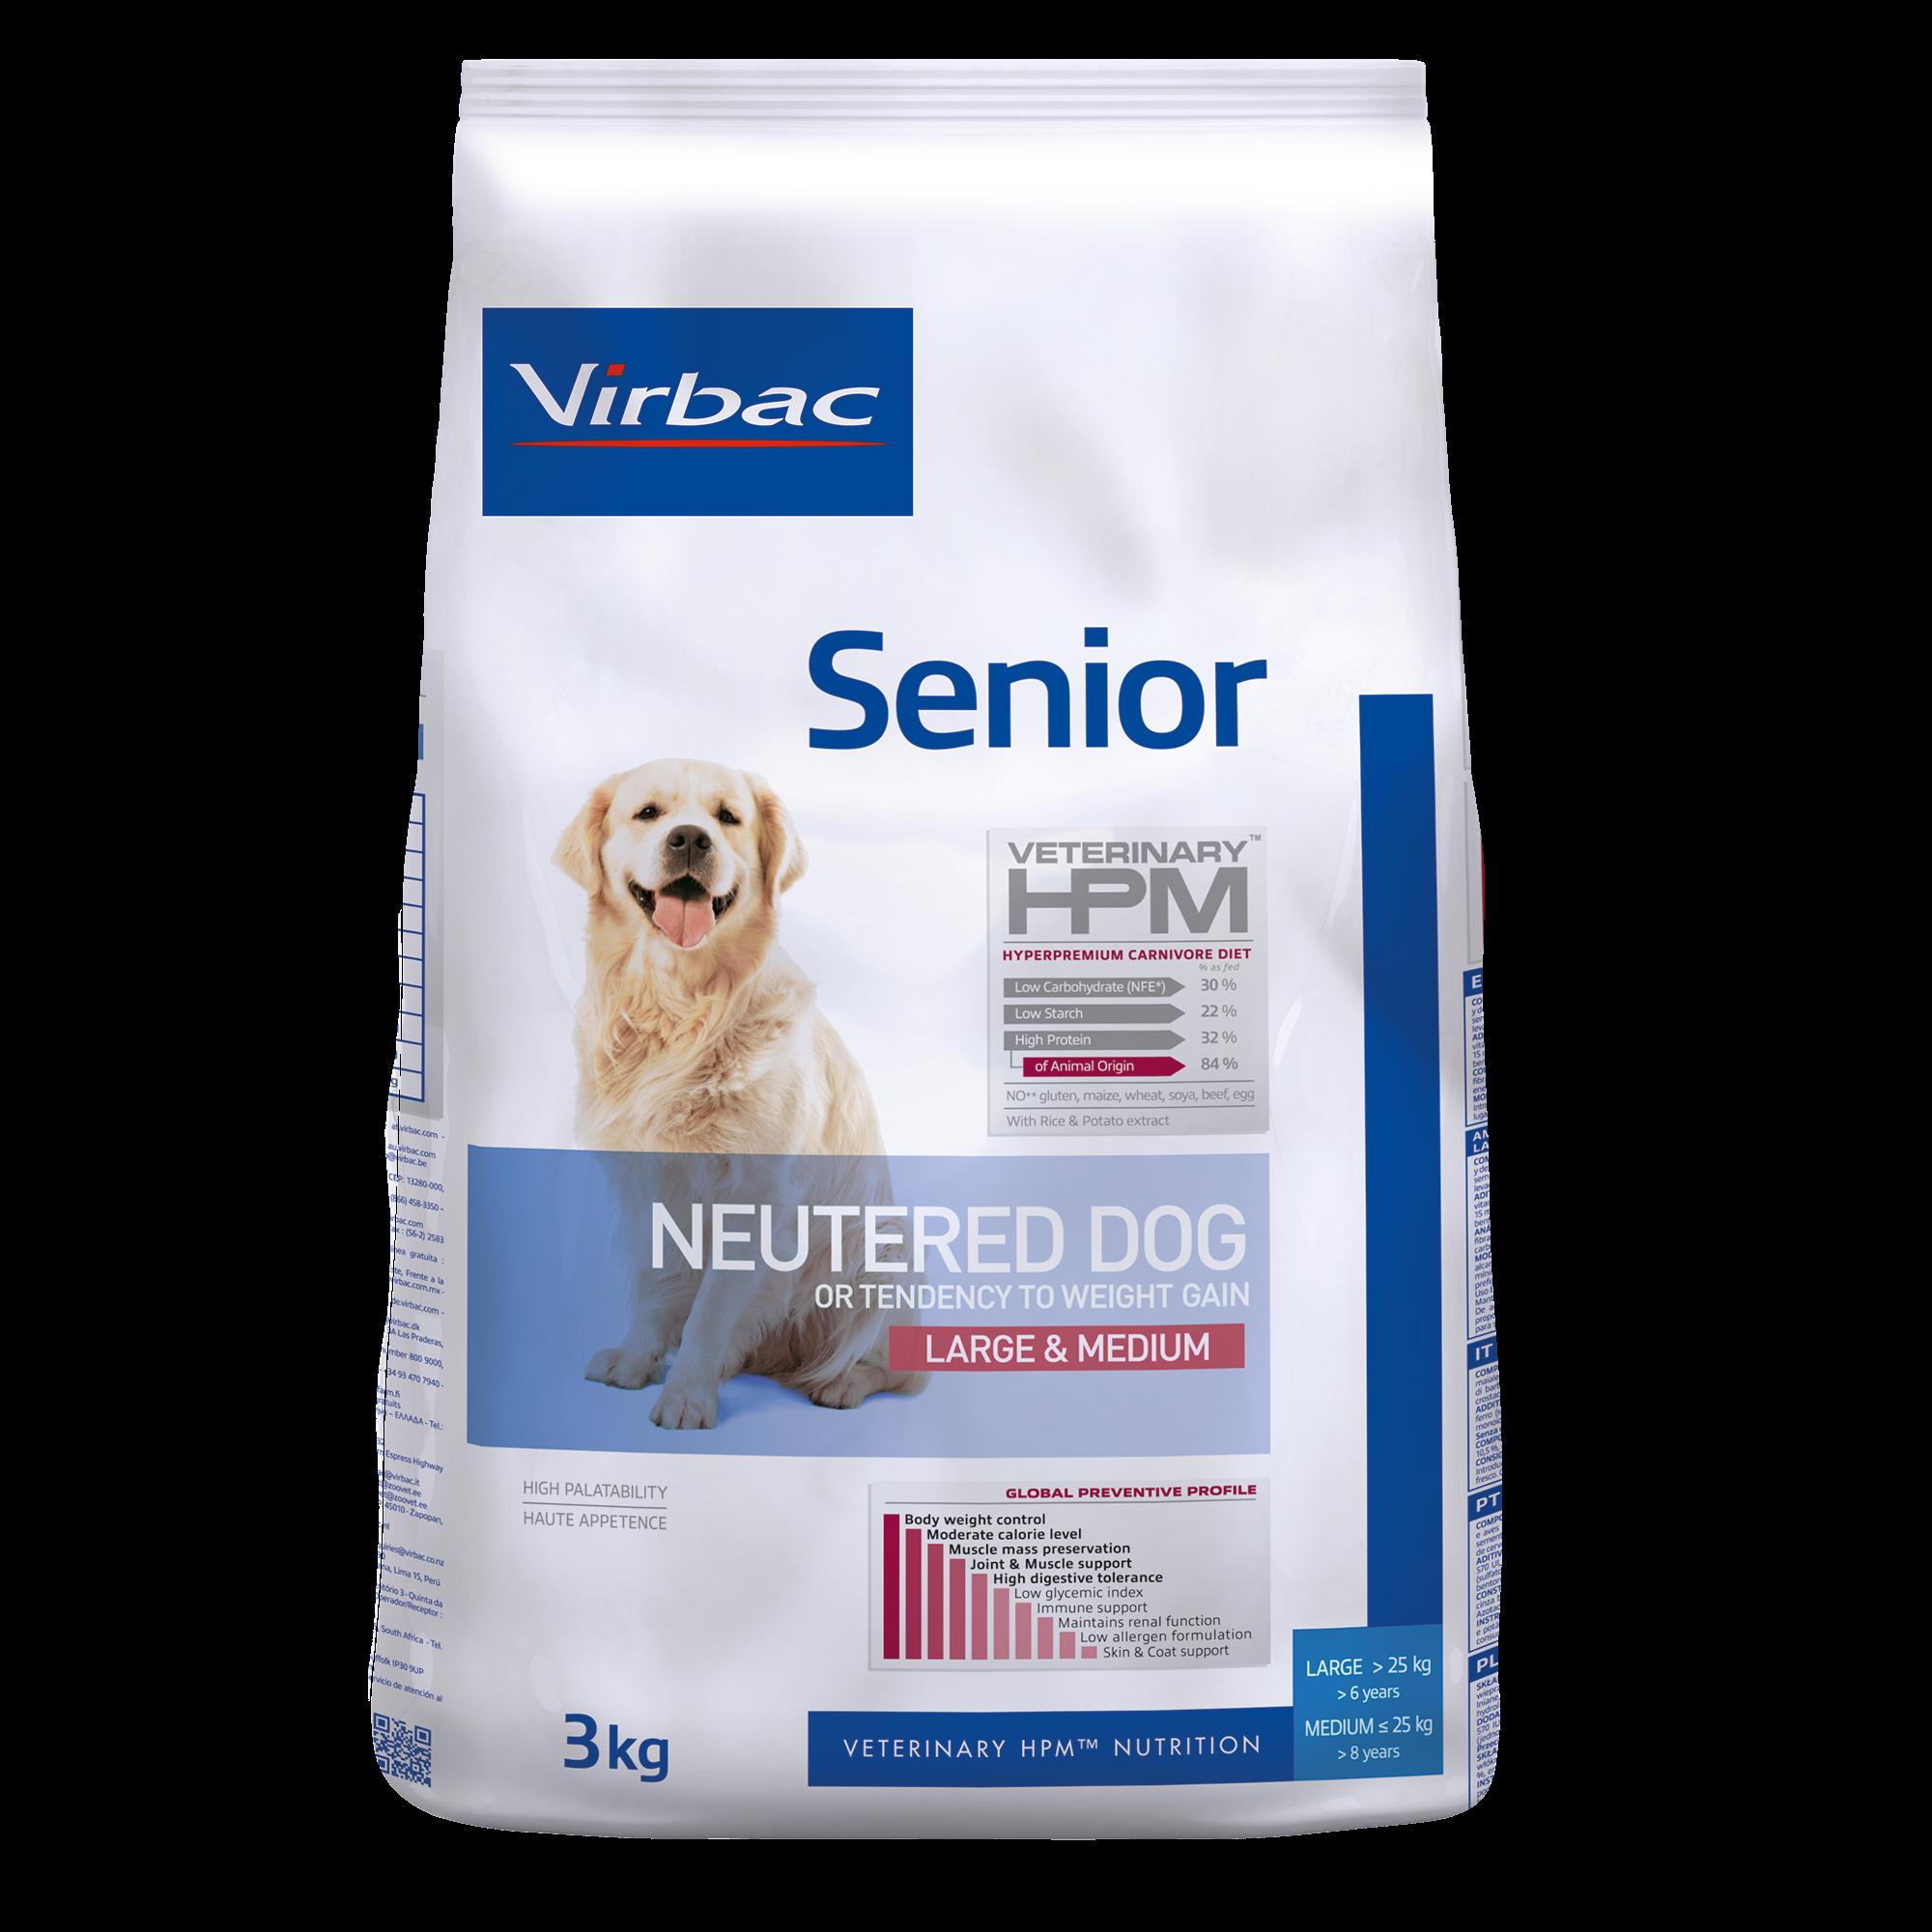 Senior Neutered Dog Large & Medium - 3 kg